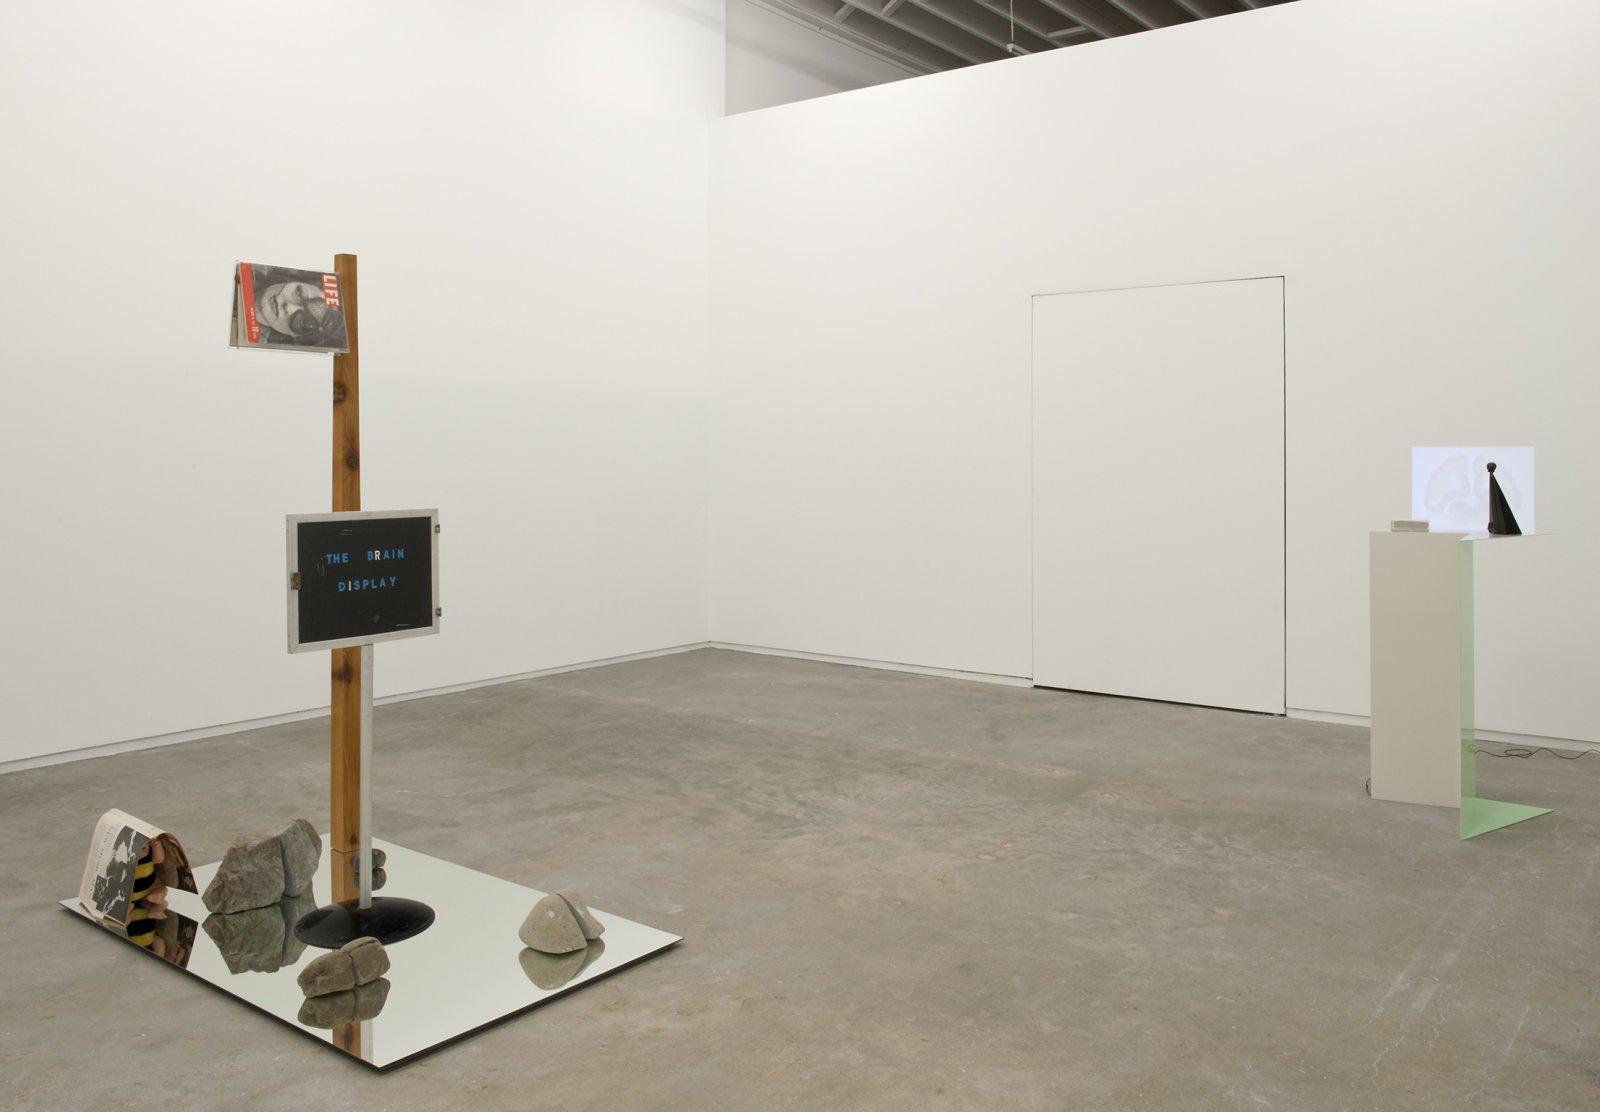 Judy Radul, installation view, Catriona Jeffries, 2012  by Judy Radul